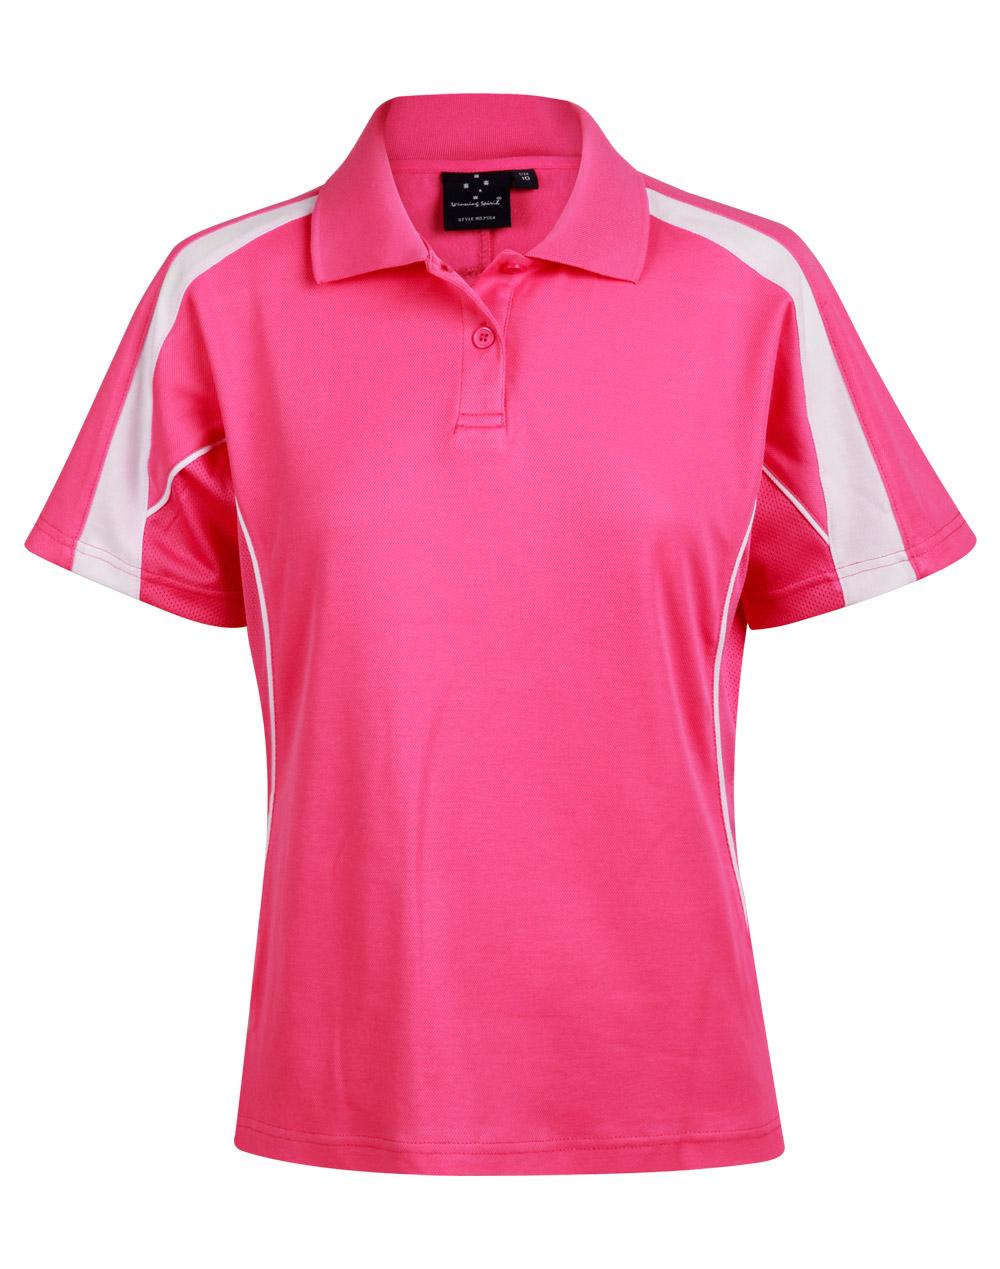 Hot Pink.White